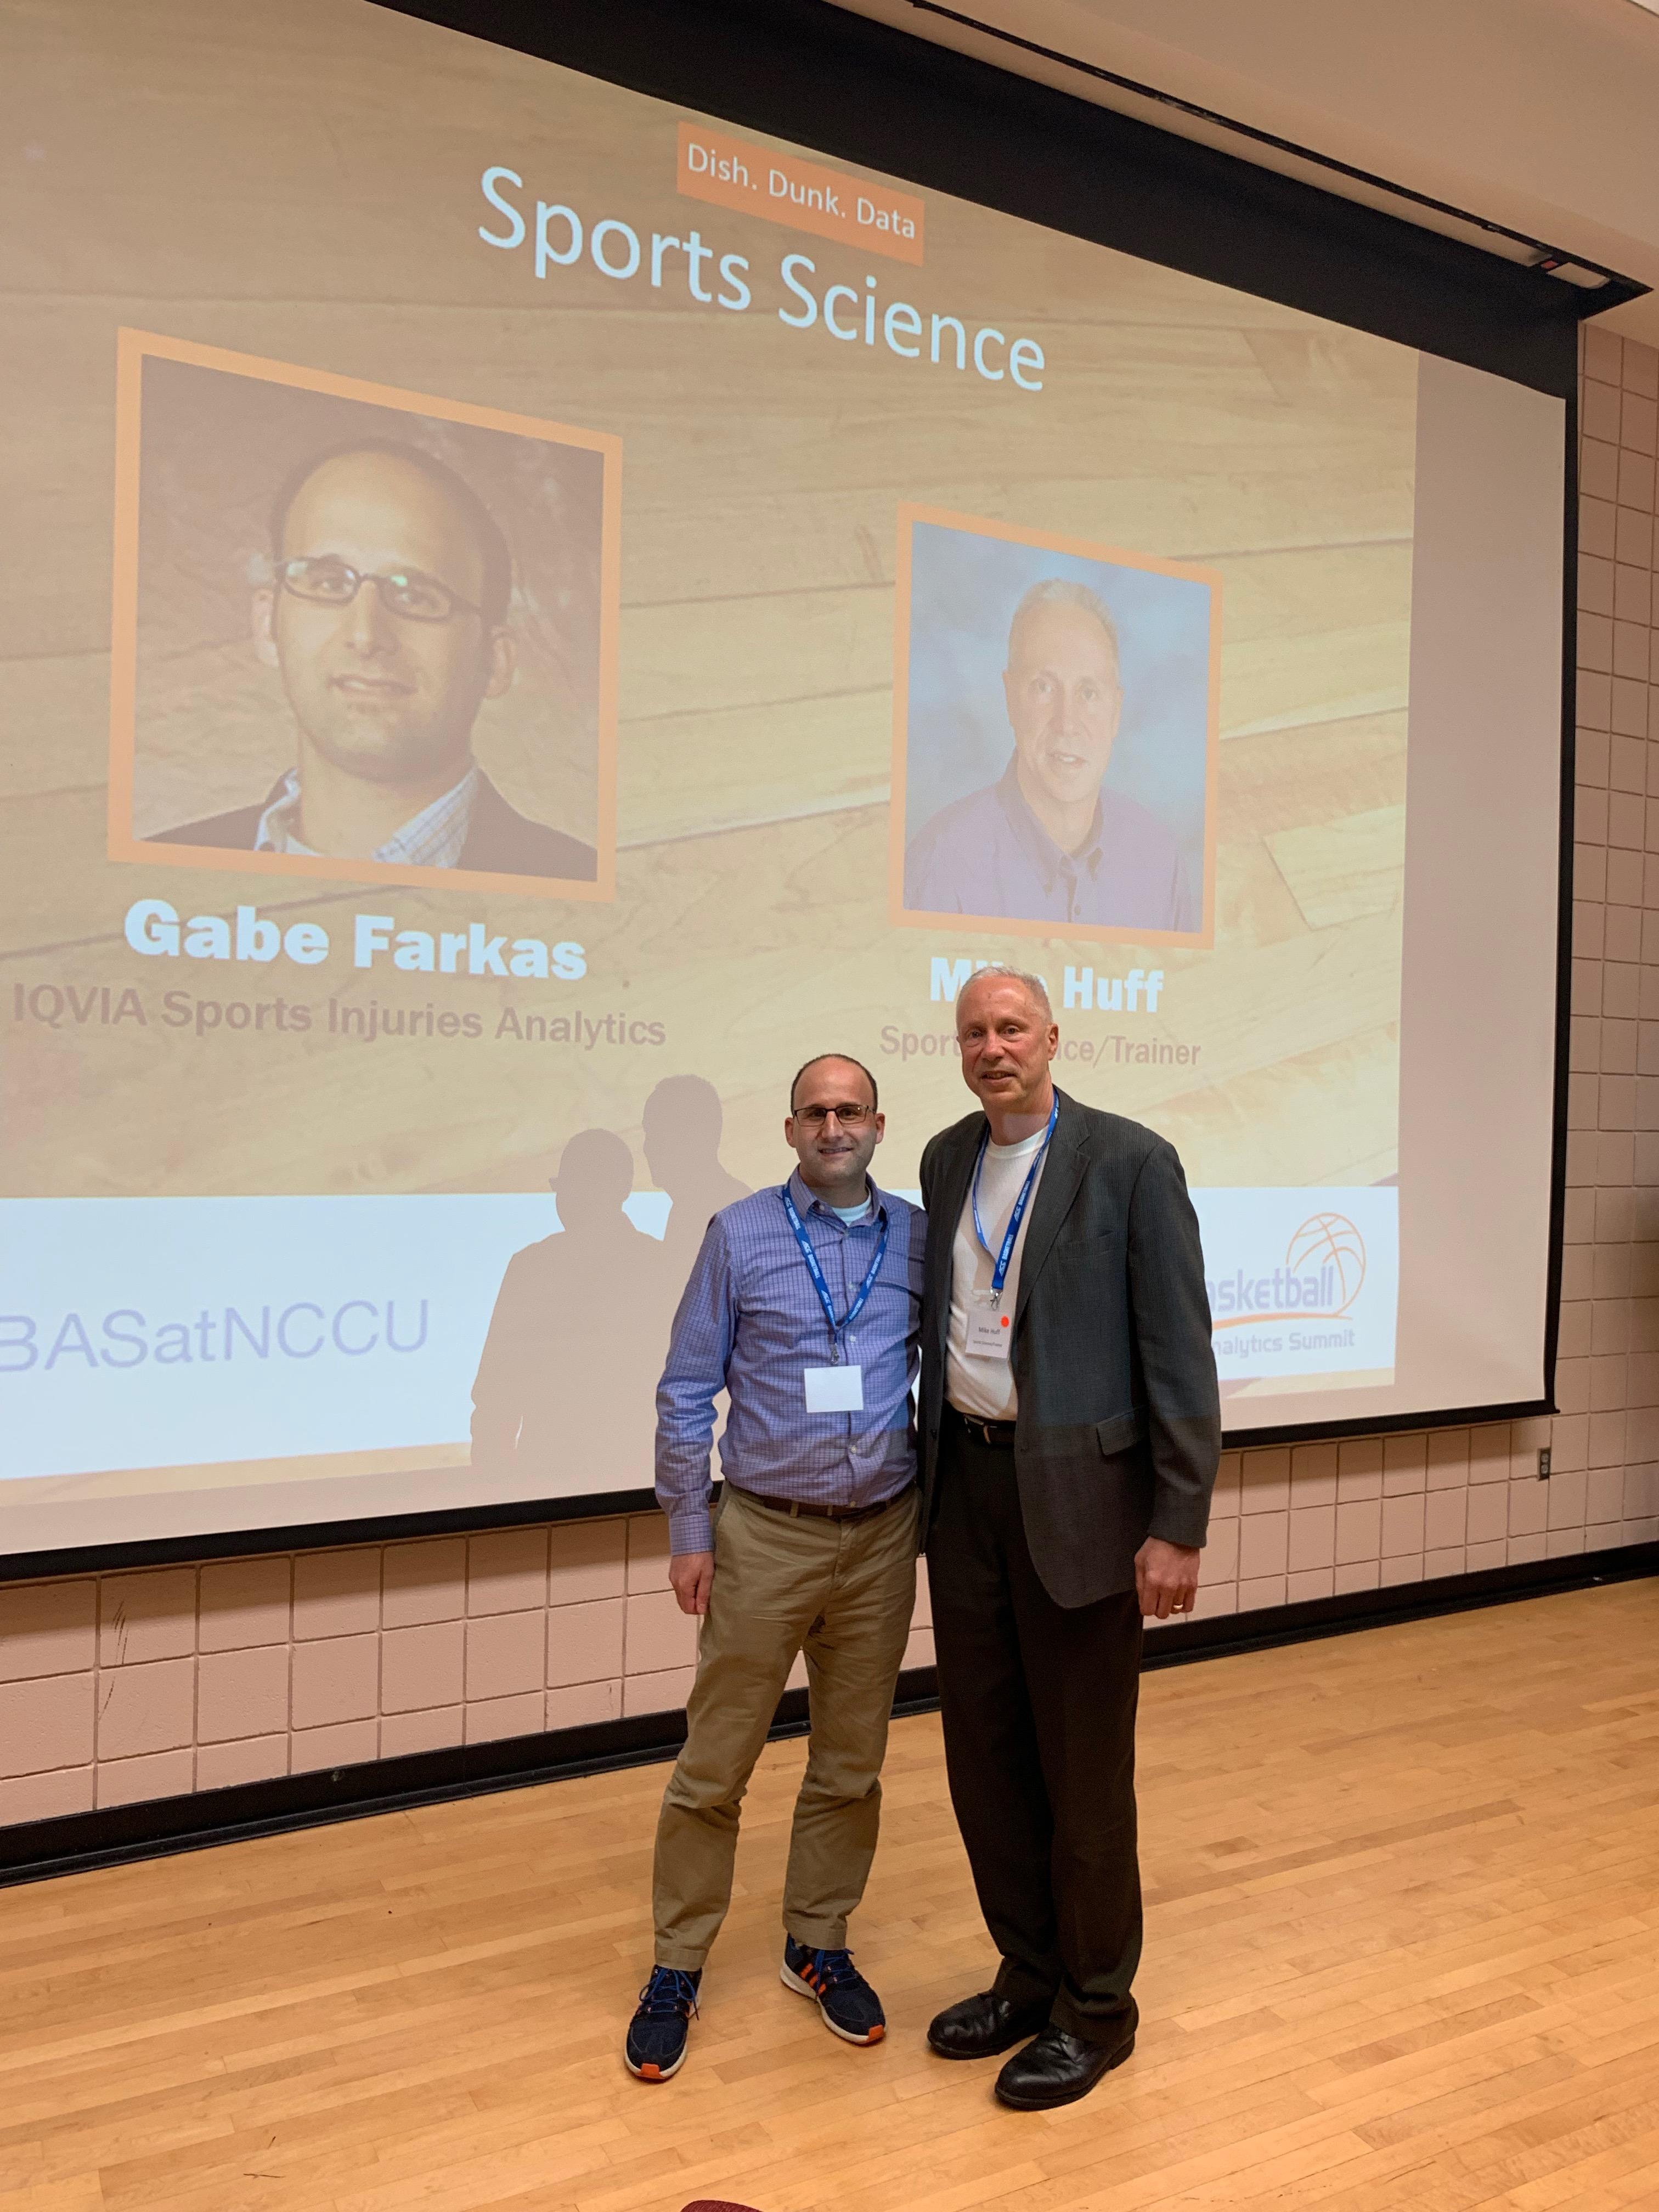 Gabe Farkas & Mike Huff